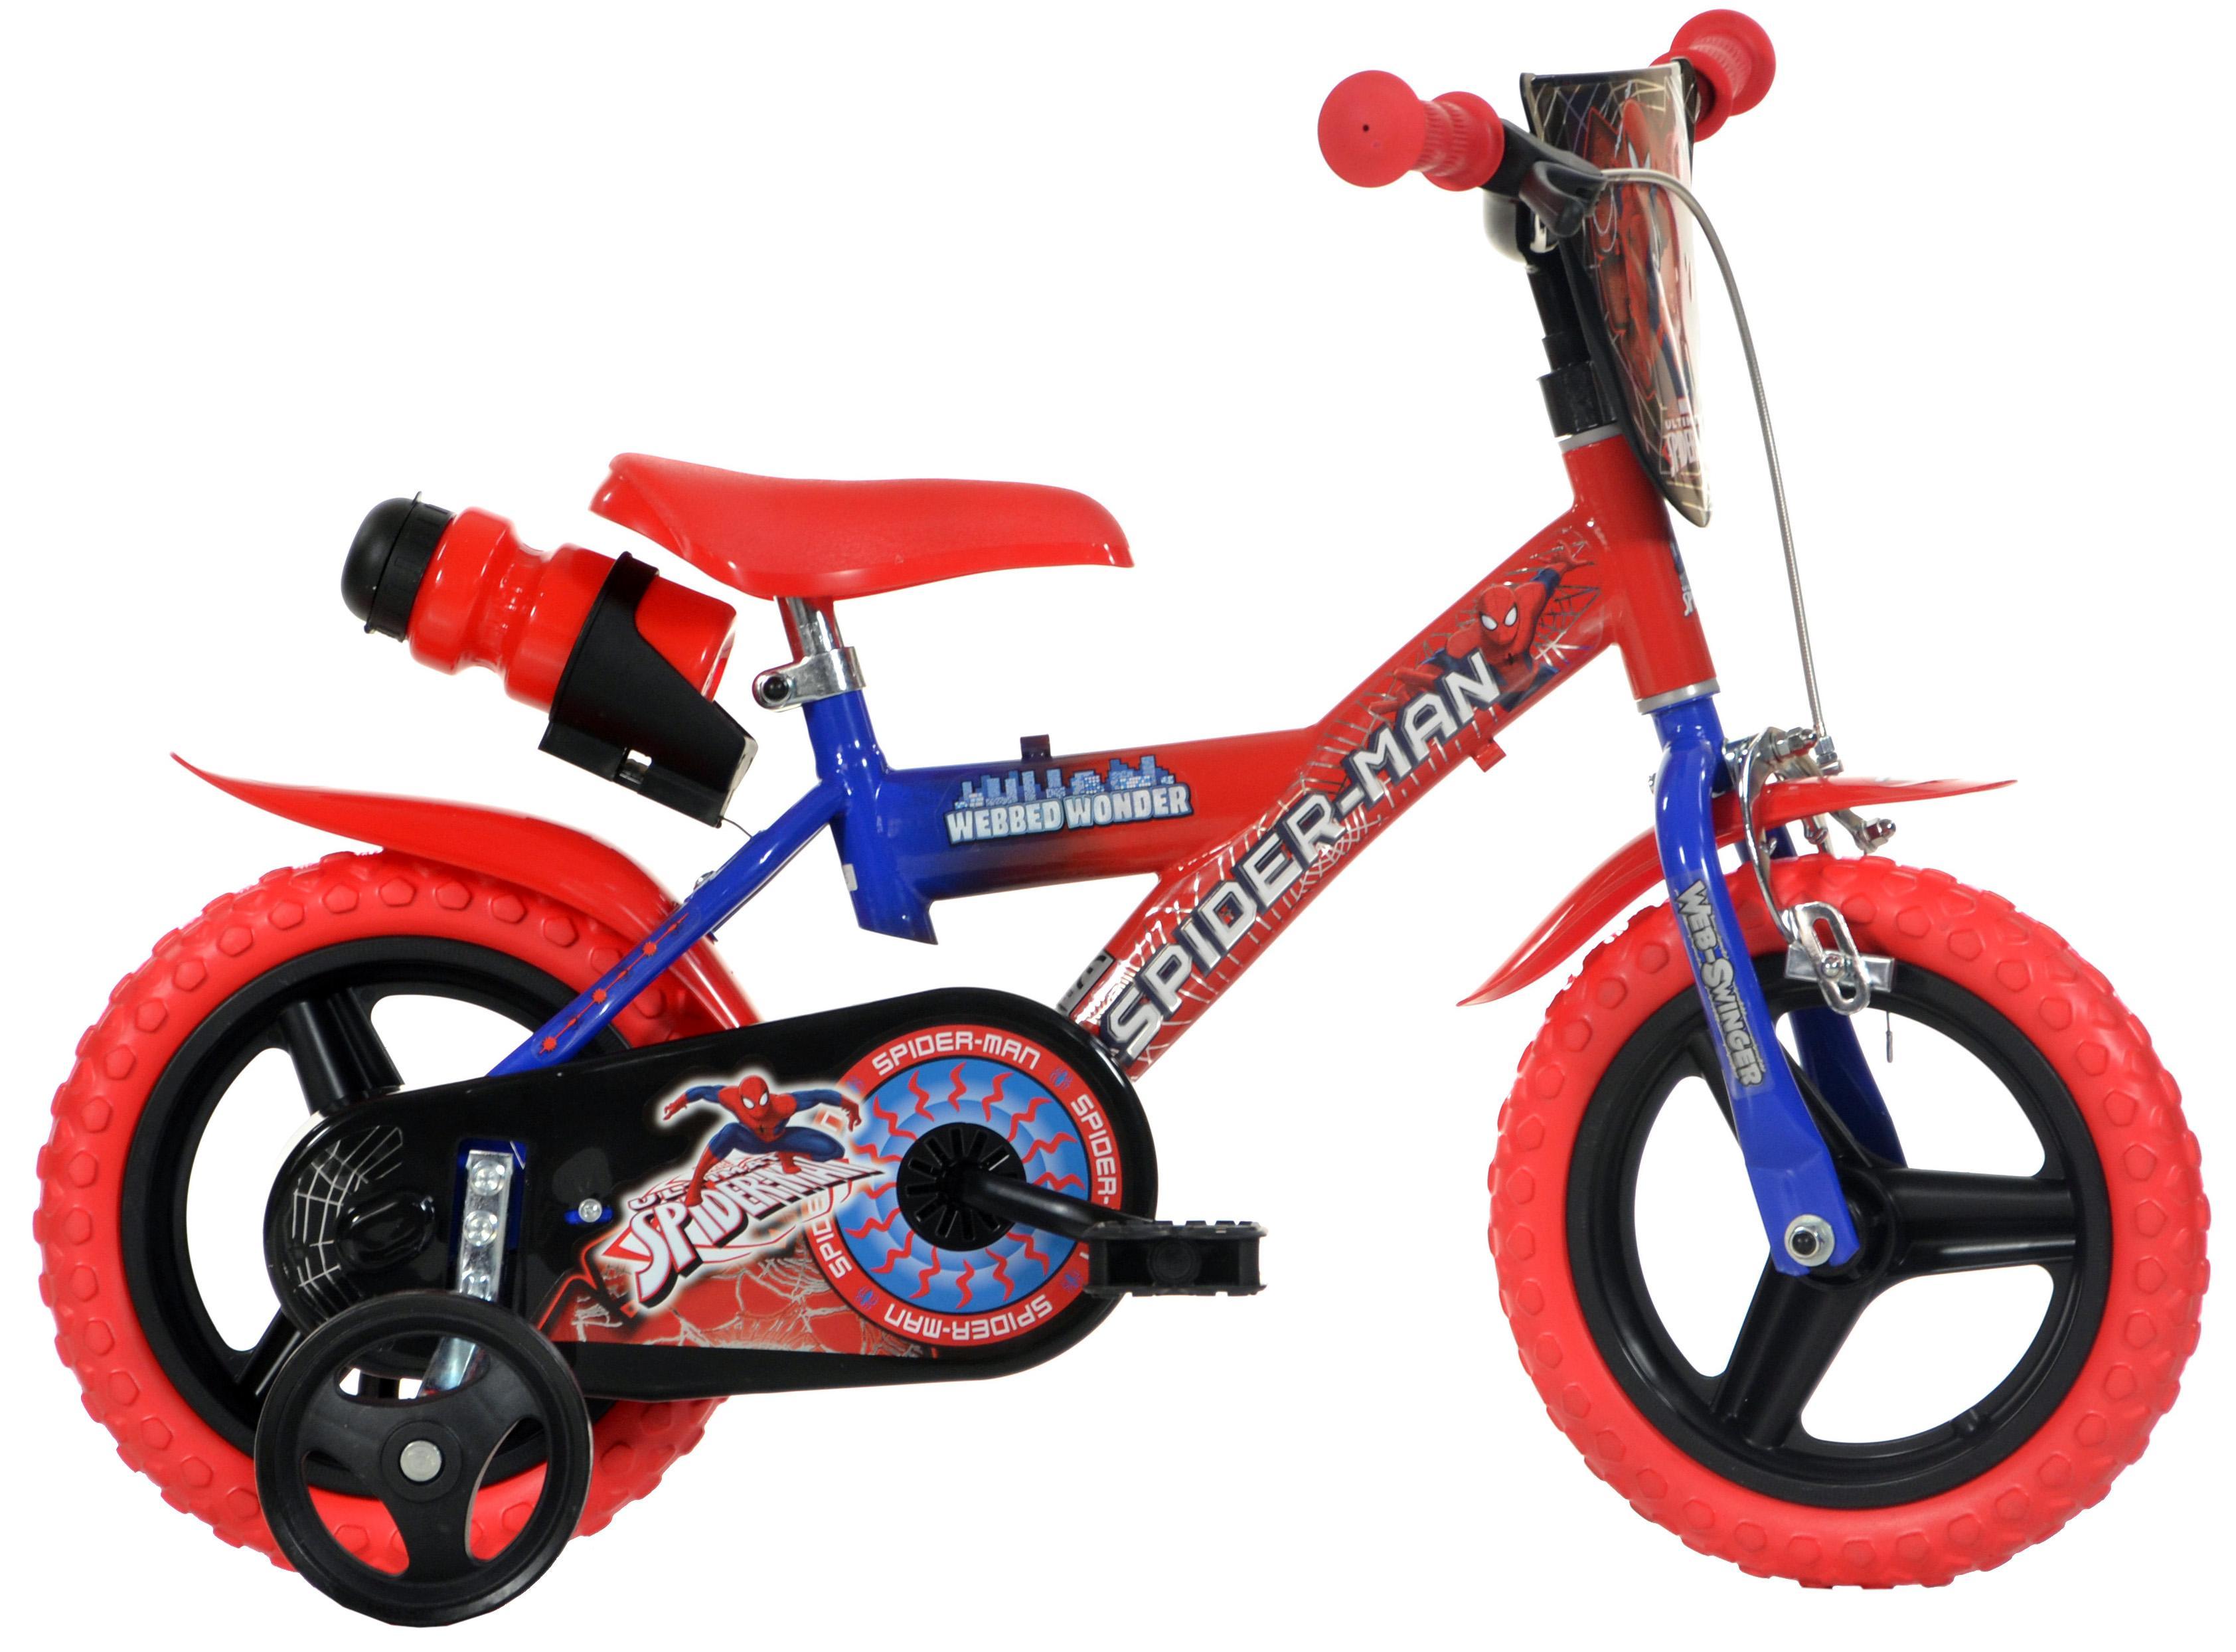 Spiderman Kids Bike - 12 inch Wheel